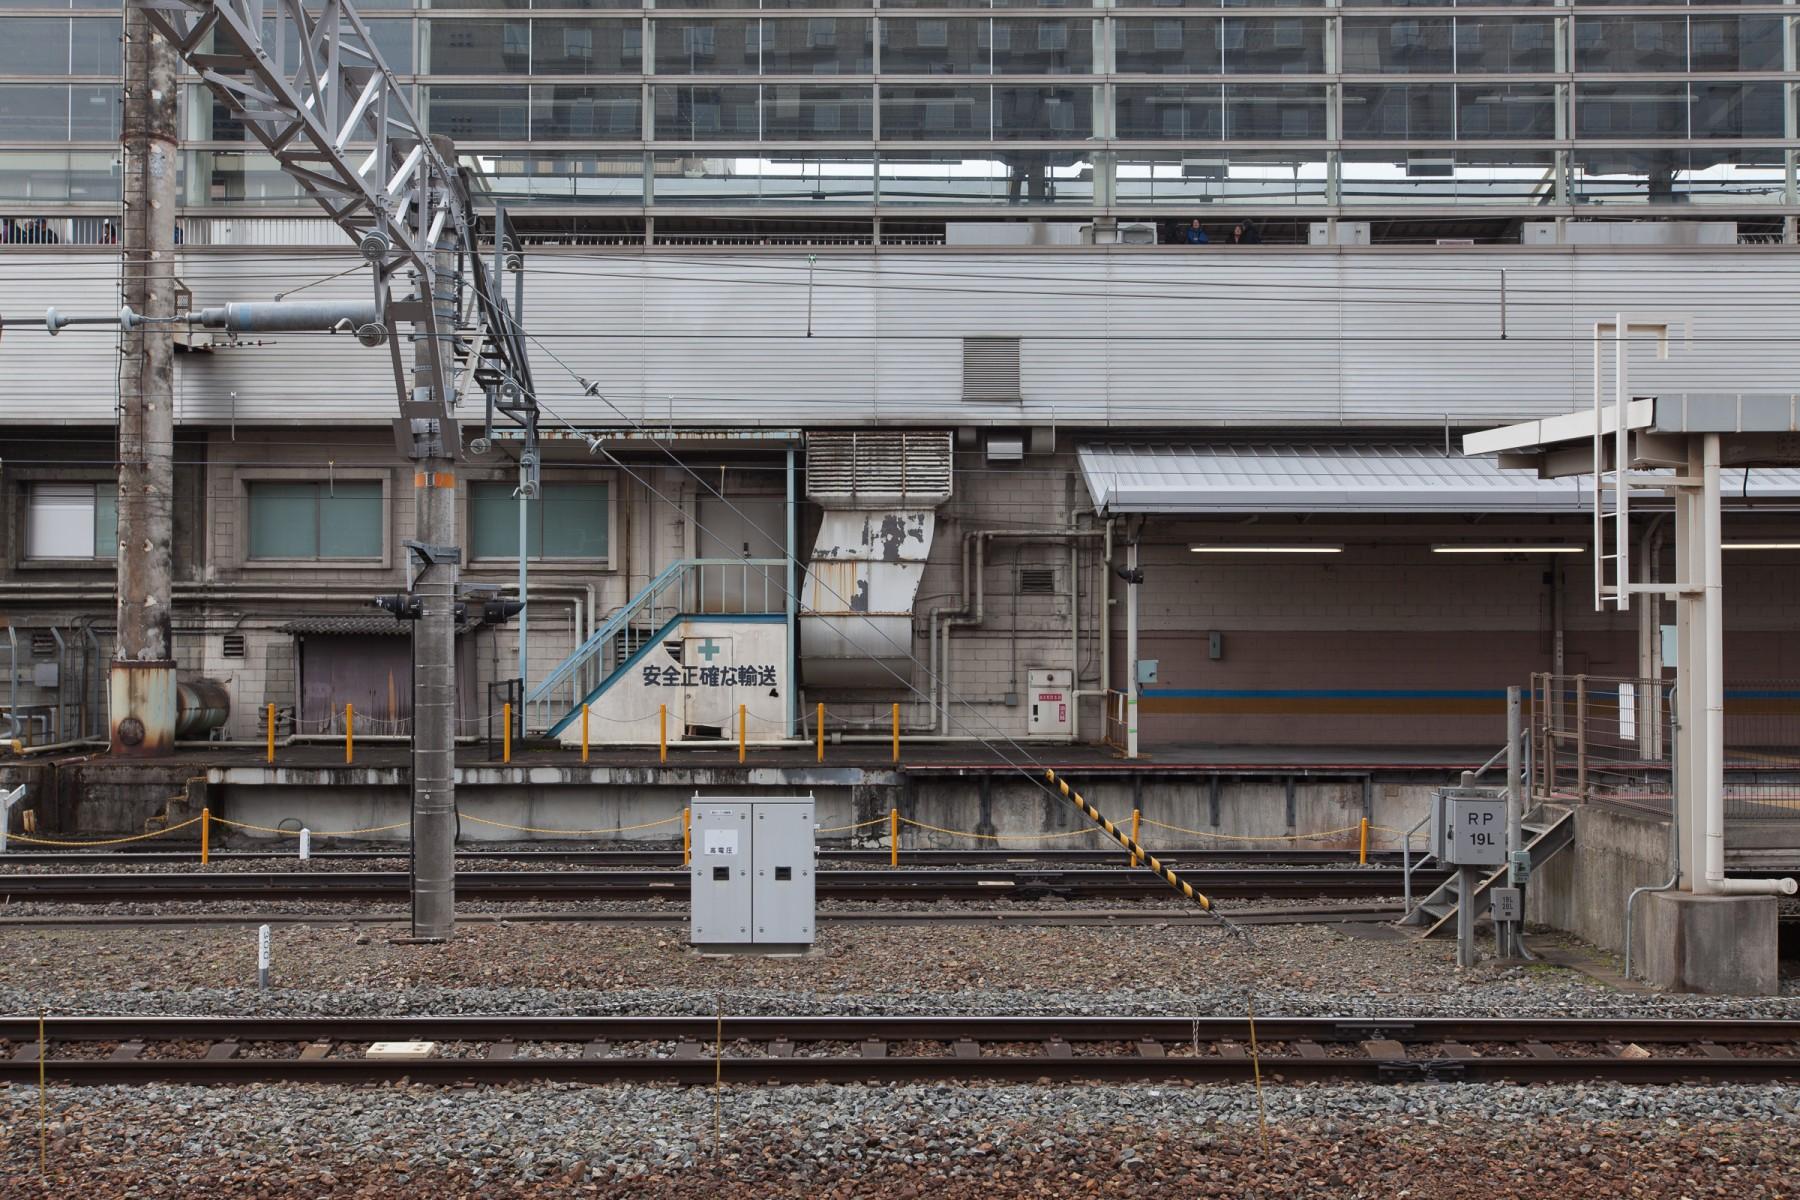 A platform at Kyoto Station